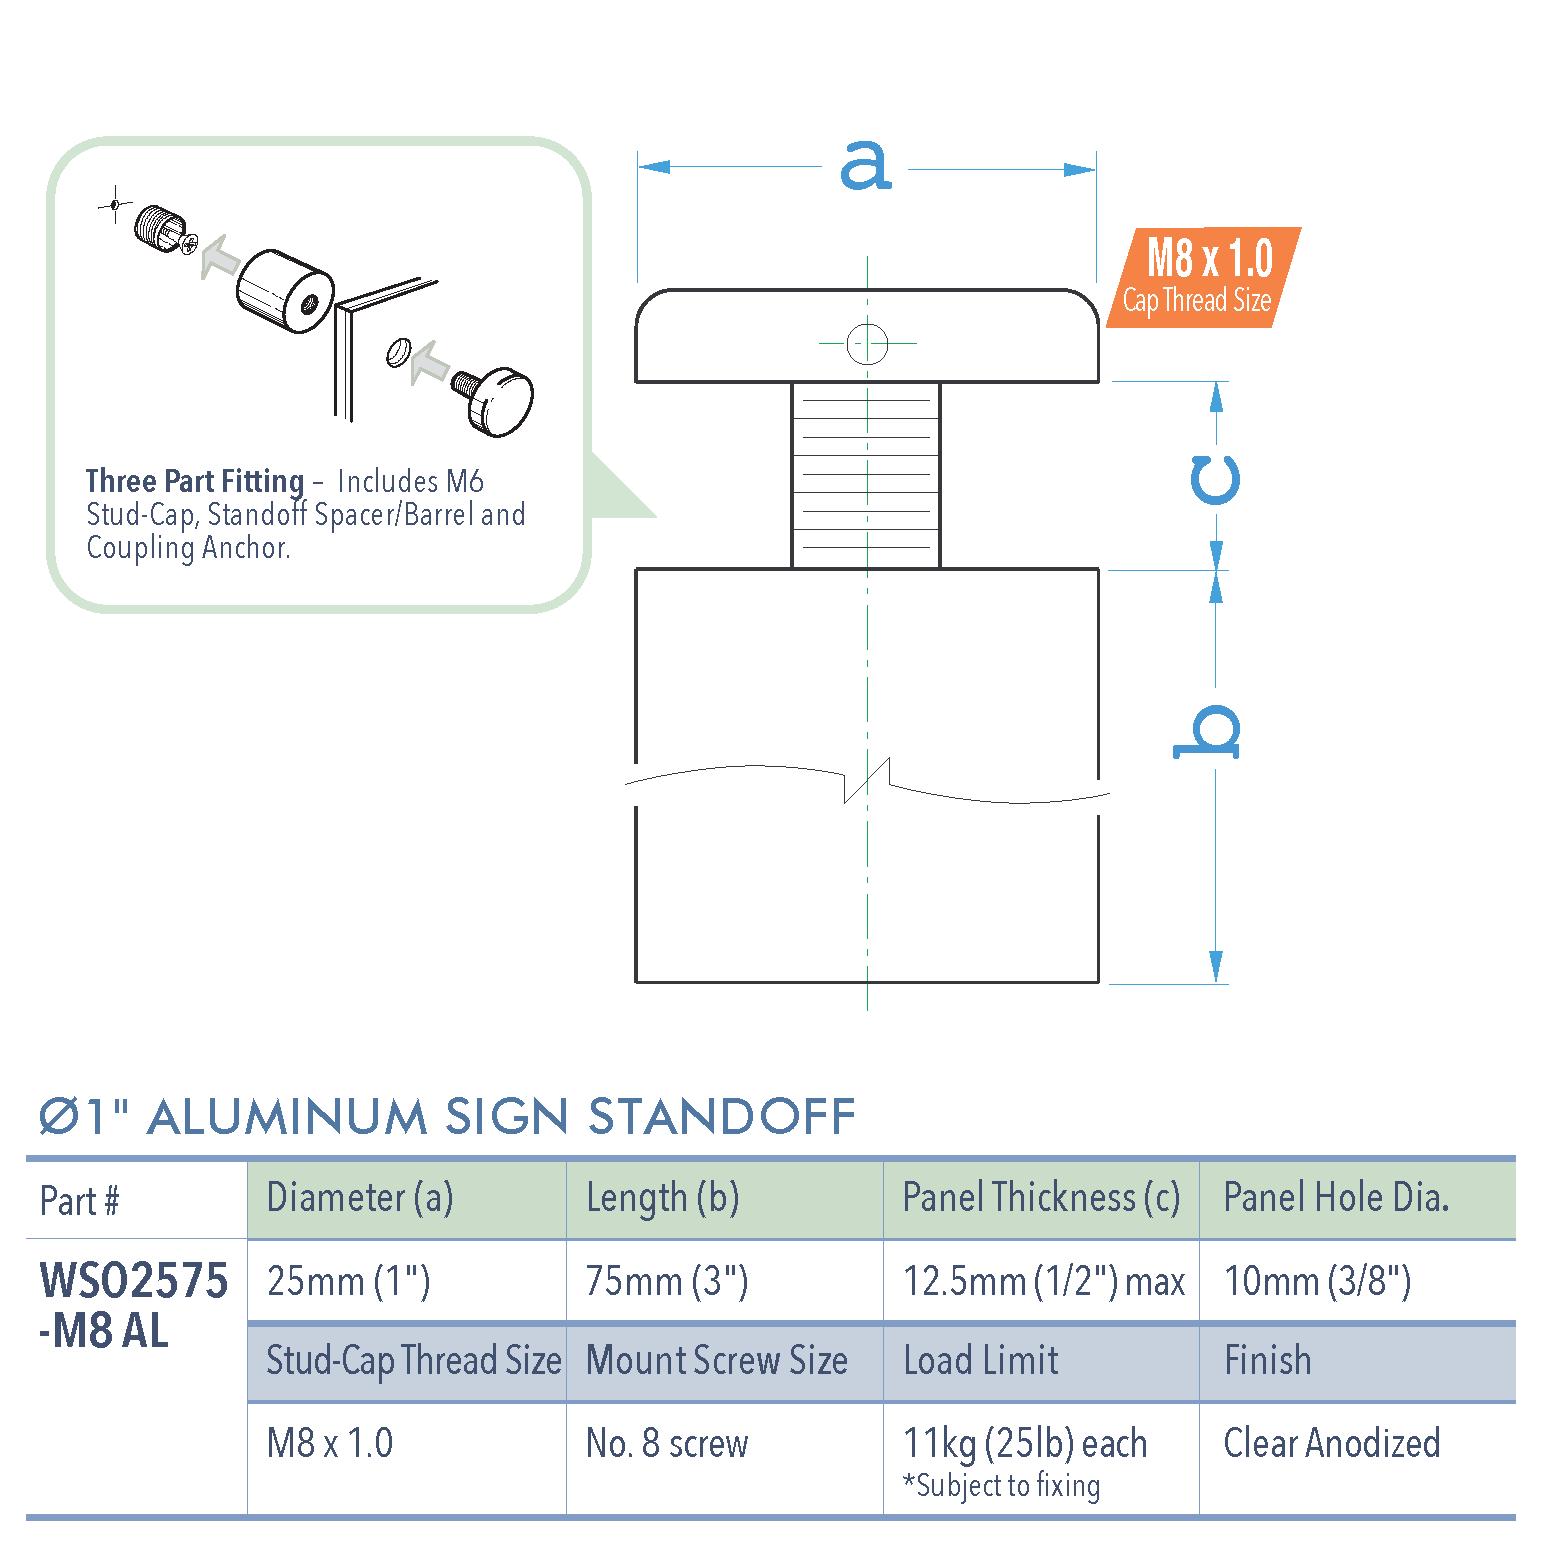 Specifications for WSO2575-M8 AL